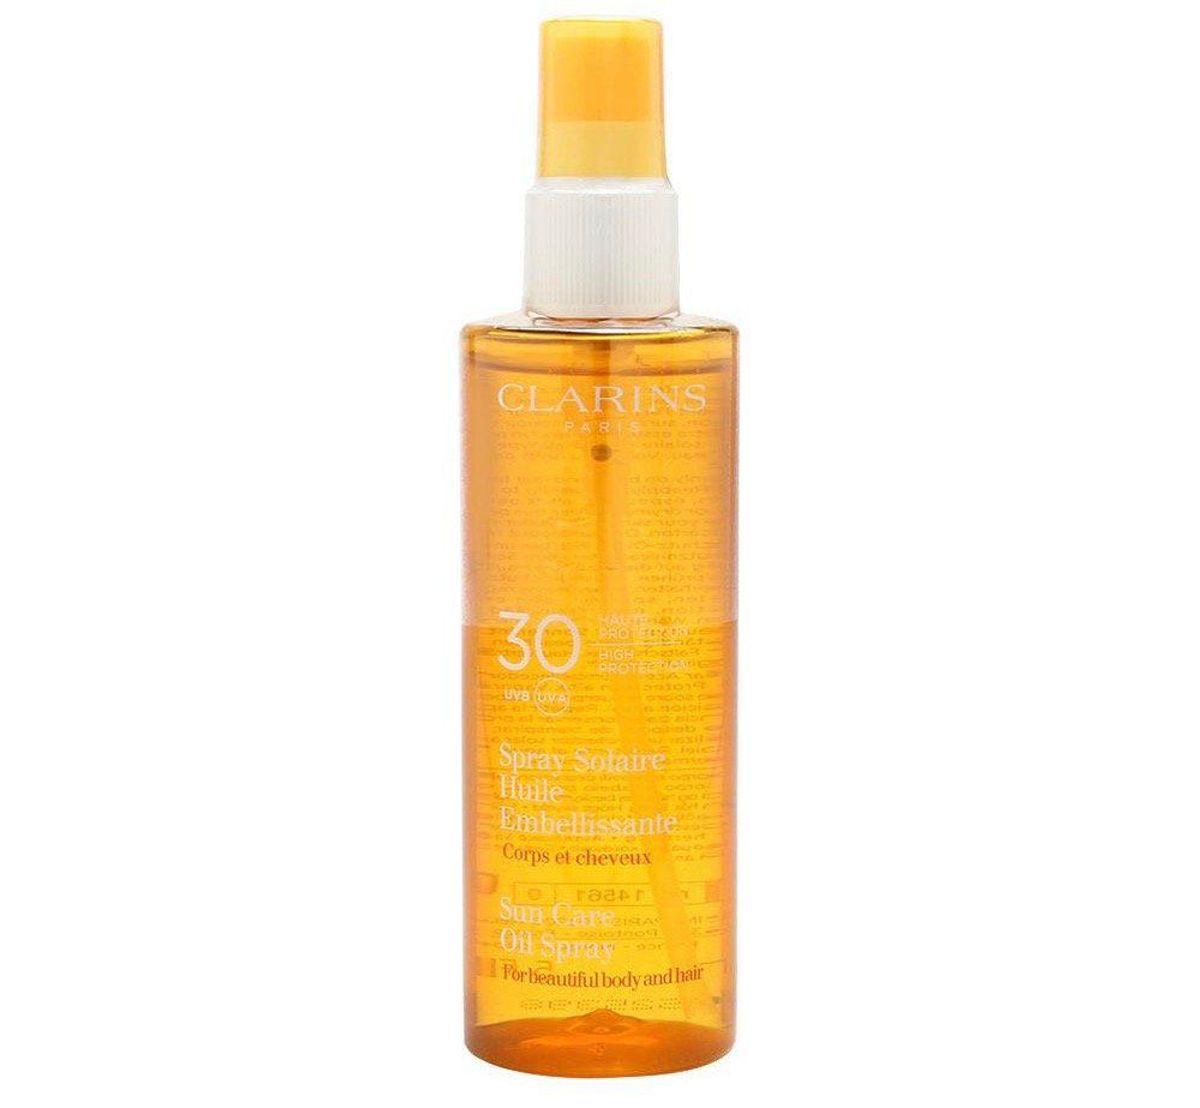 SPF 30 Sunscreen Care Oil Spray